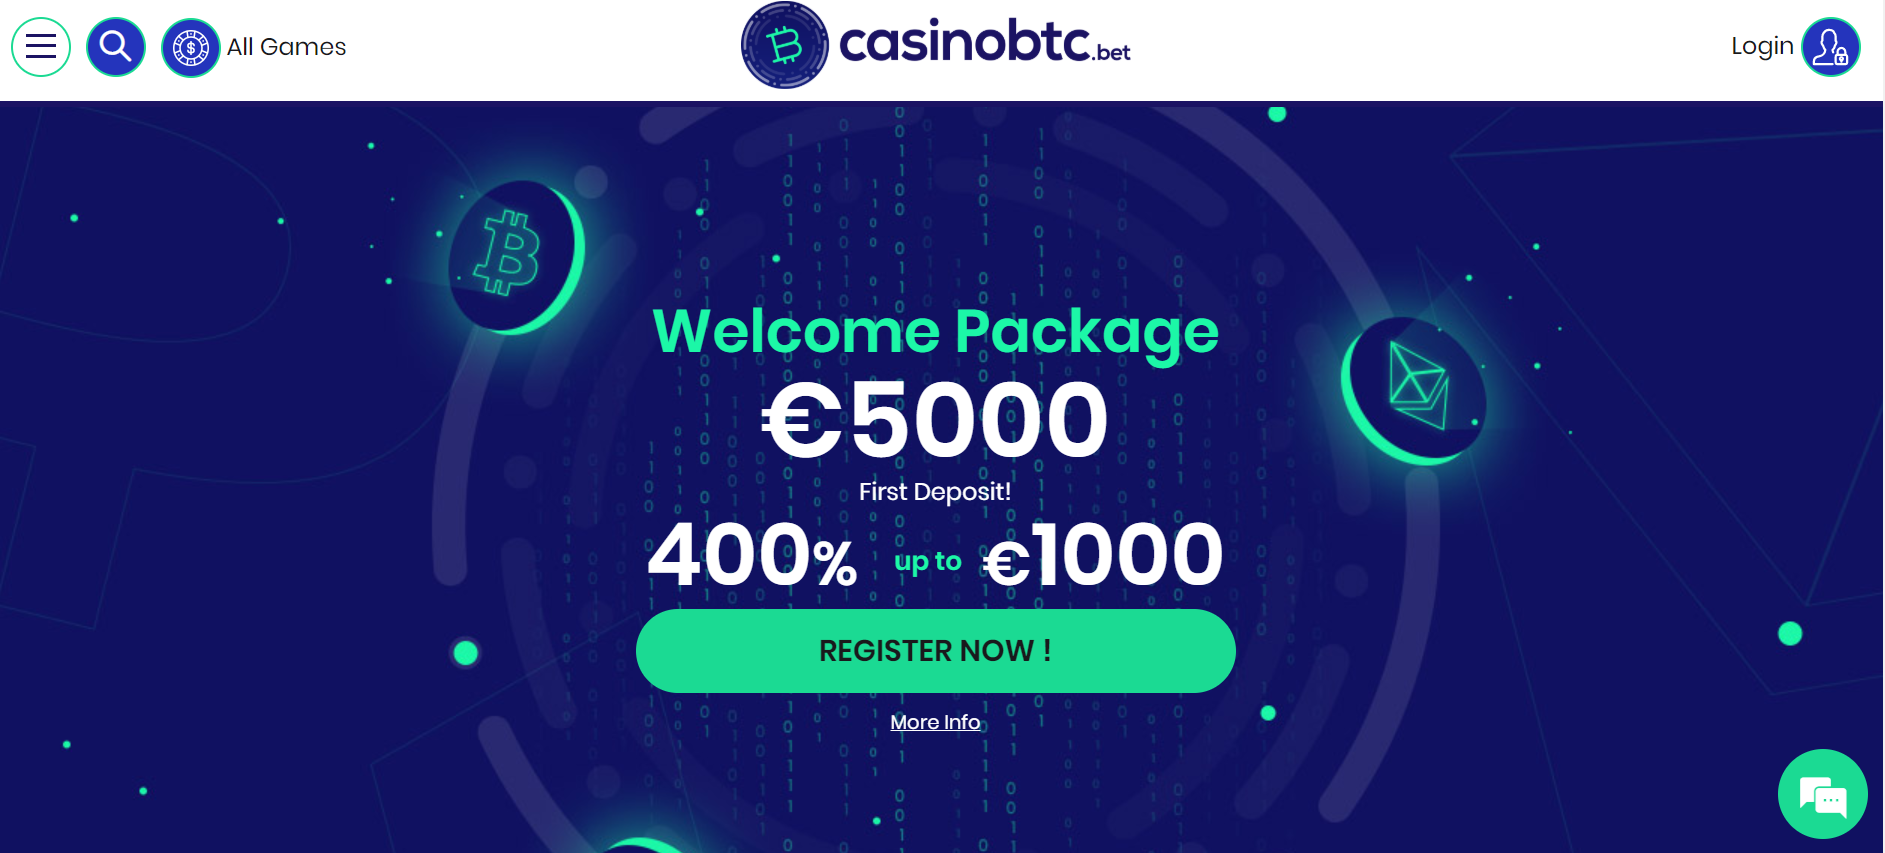 CasinoBTC - Landing Page